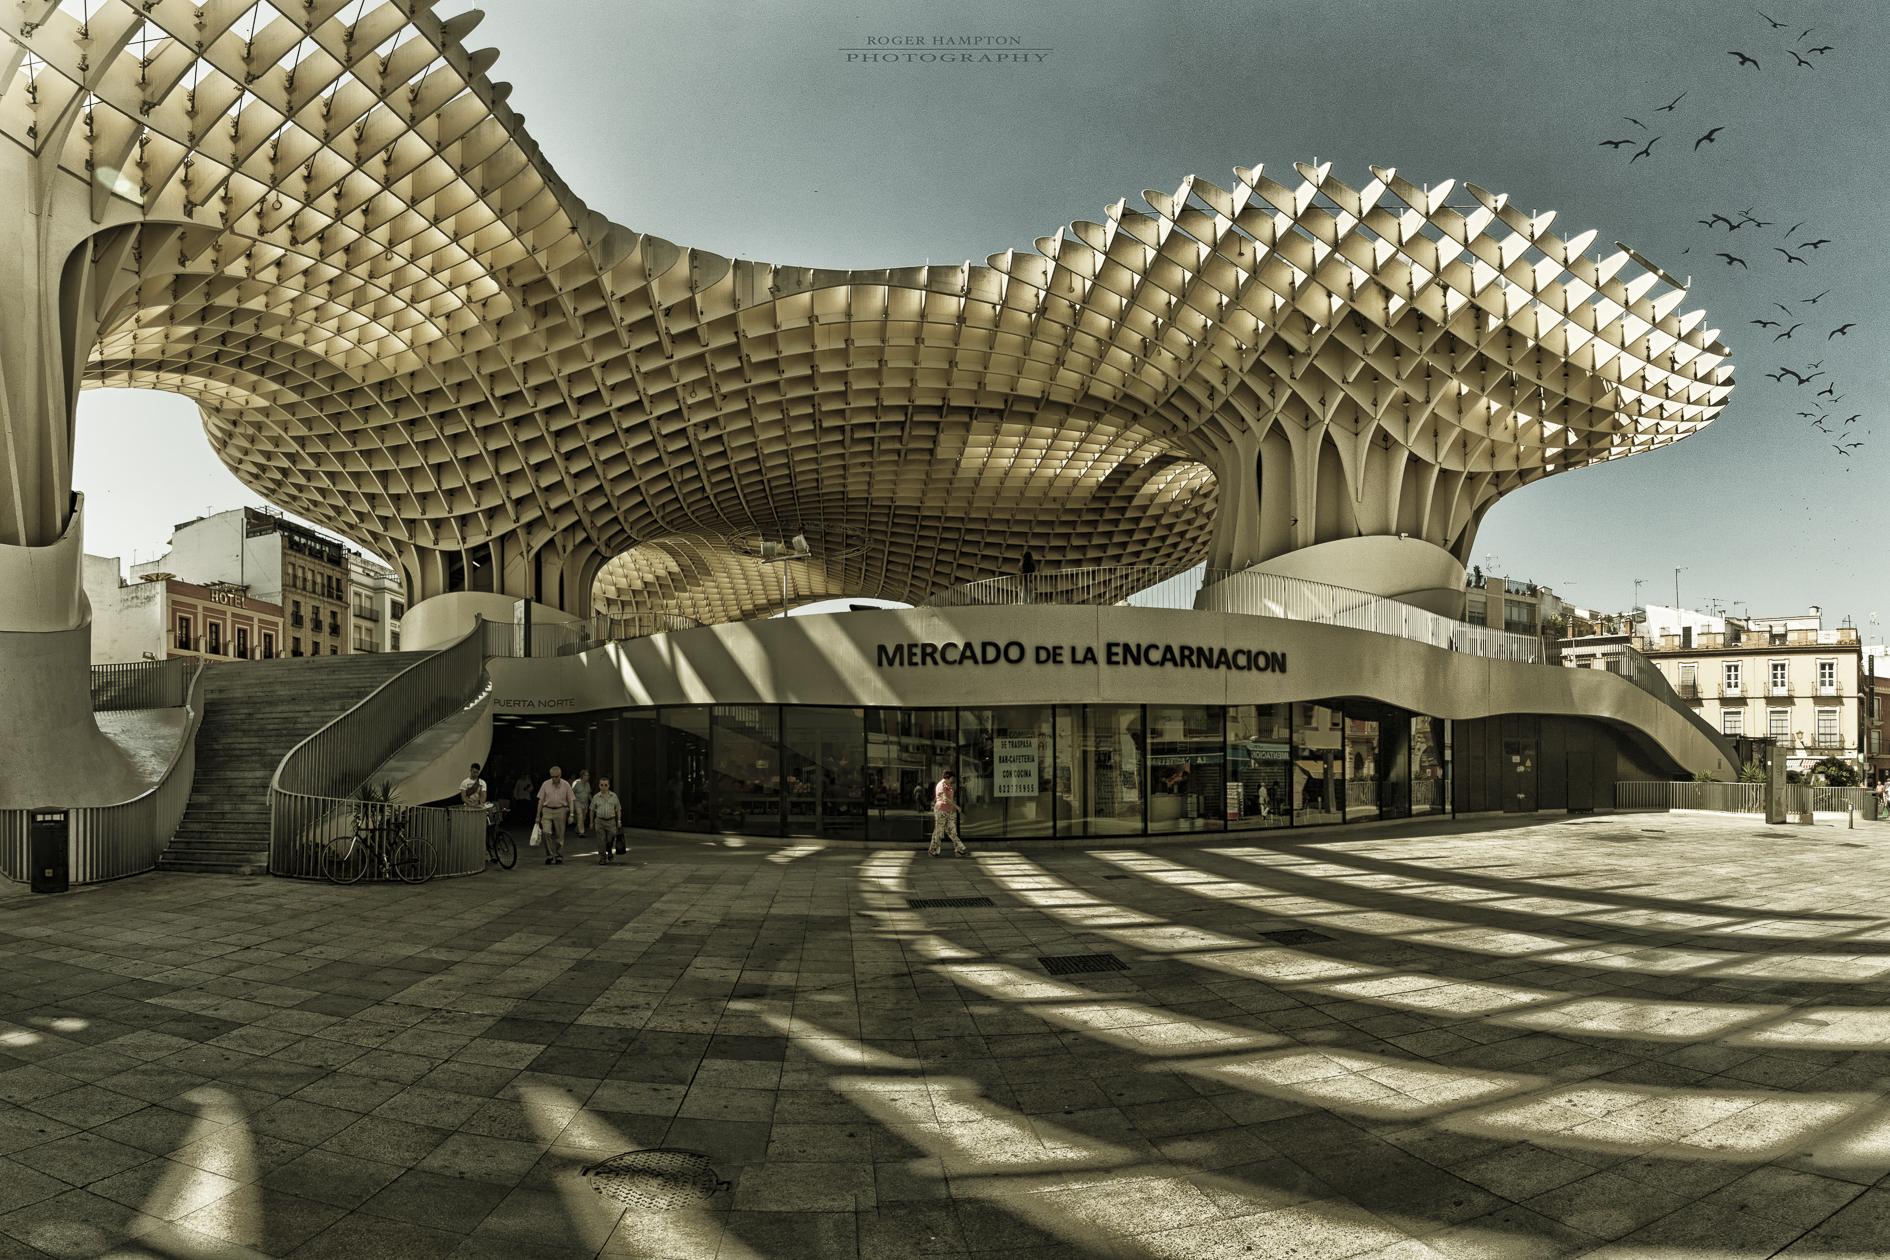 Mercado de la Encarnacion, Spain